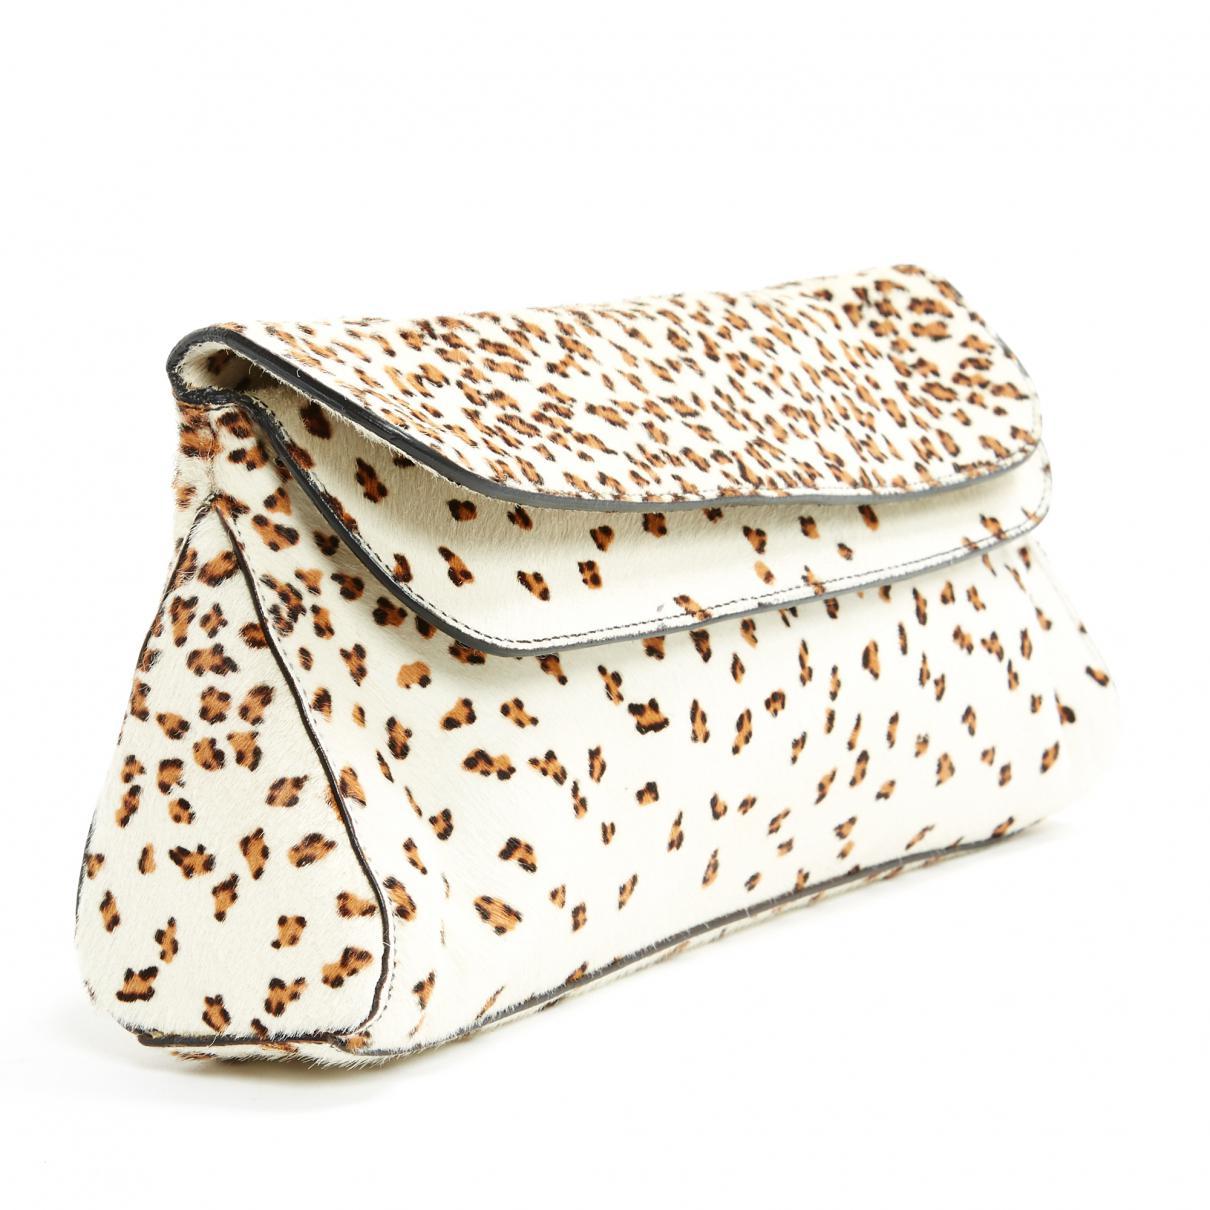 Alaia Pre-owned - Pony-style calfskin clutch bag Yu2tH1